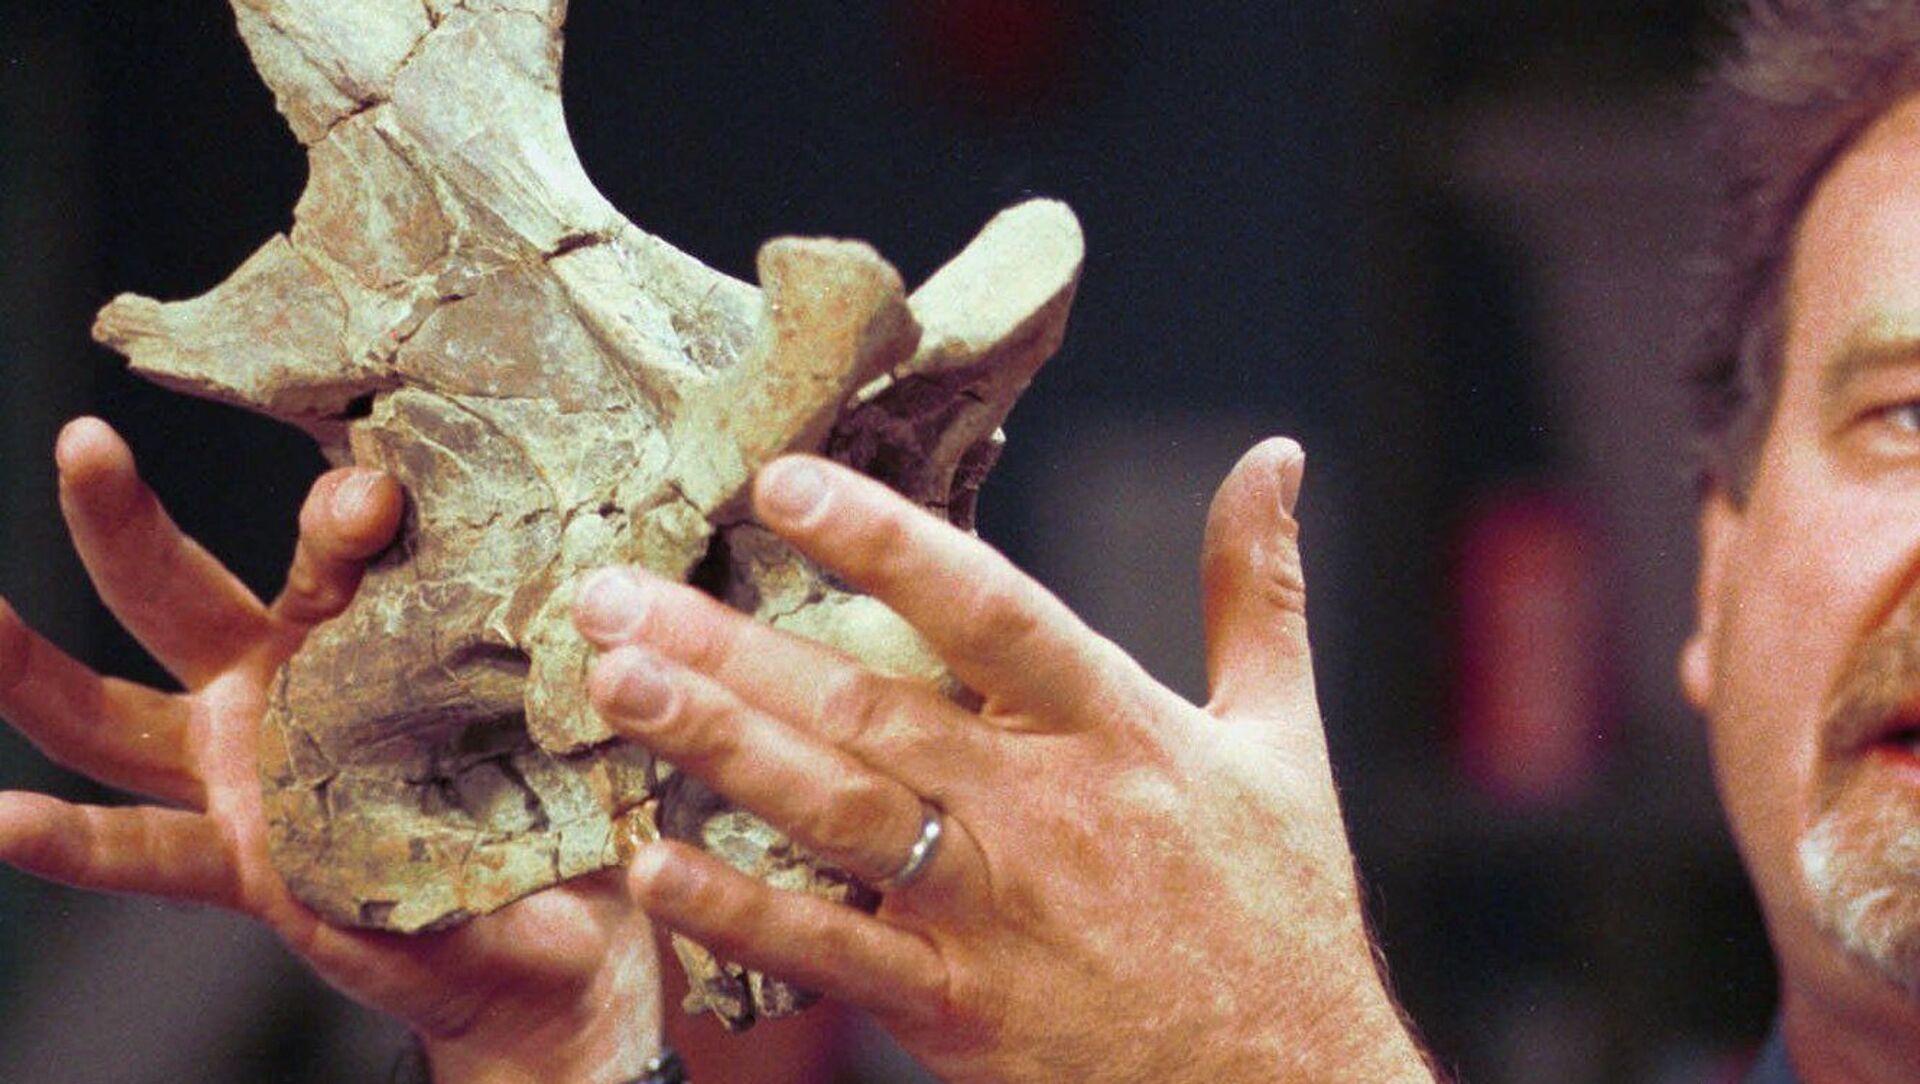 Un hombre sostiene un fosil de la vértebra de un saurópodo (archivo) - Sputnik Mundo, 1920, 19.01.2021